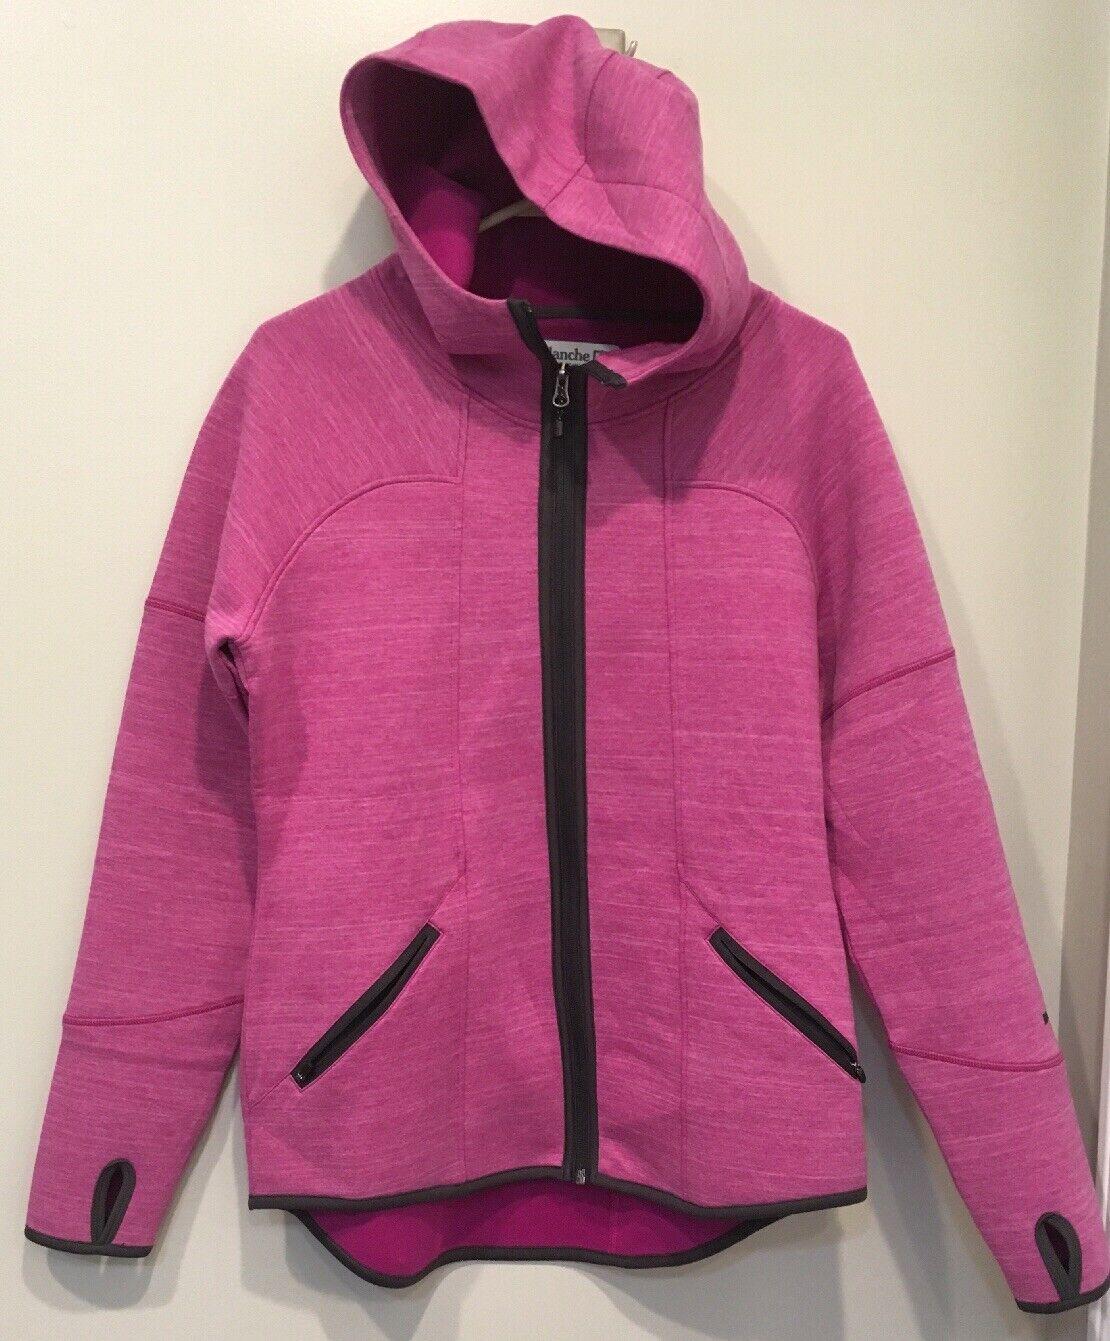 Avalanche Ladies Women's Full Zip Knit Jacket Purple Hood Hooded Large L